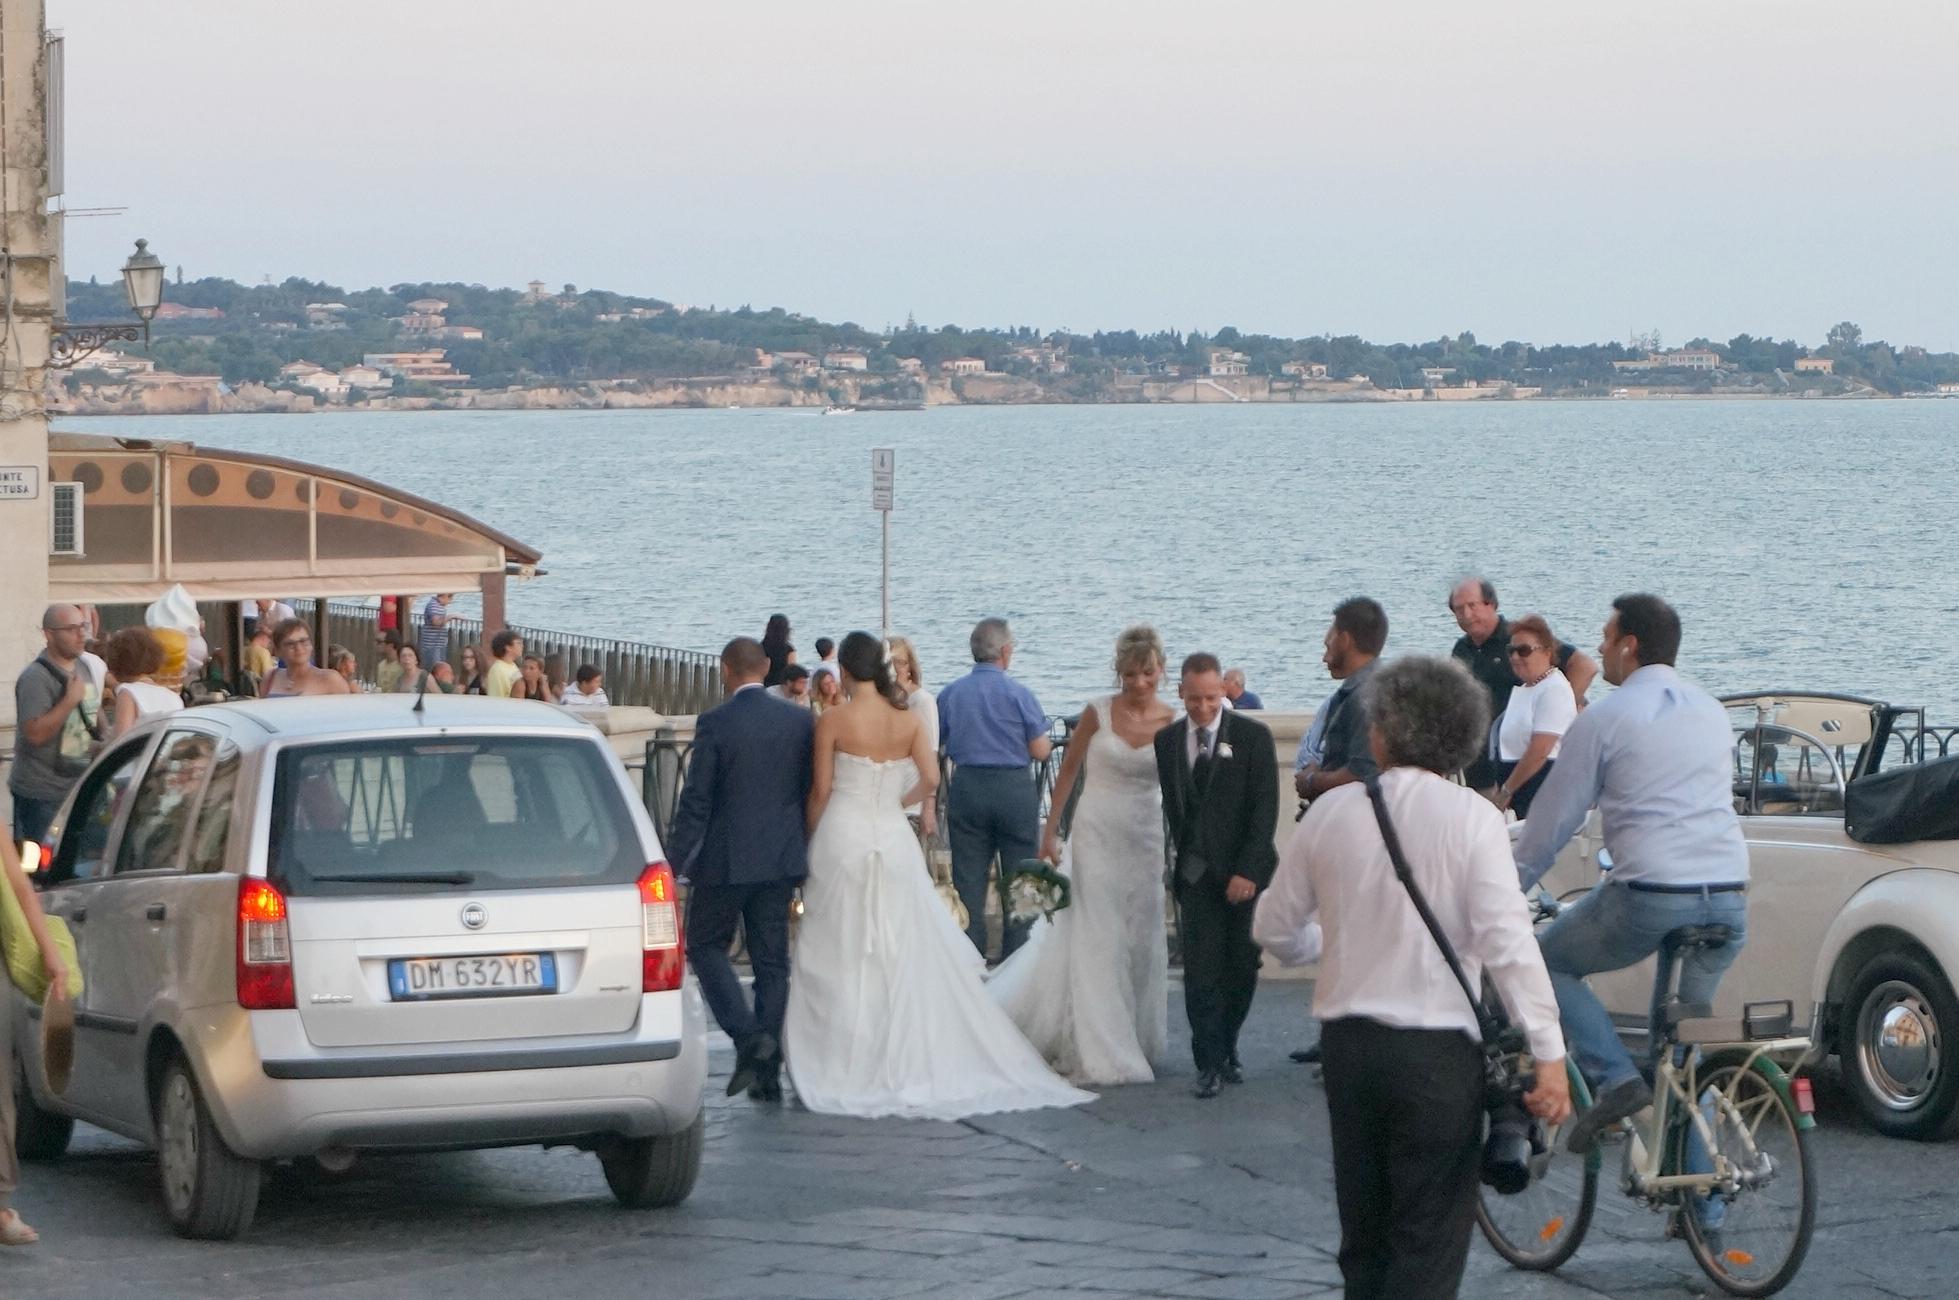 siracusa-wedding6.jpg